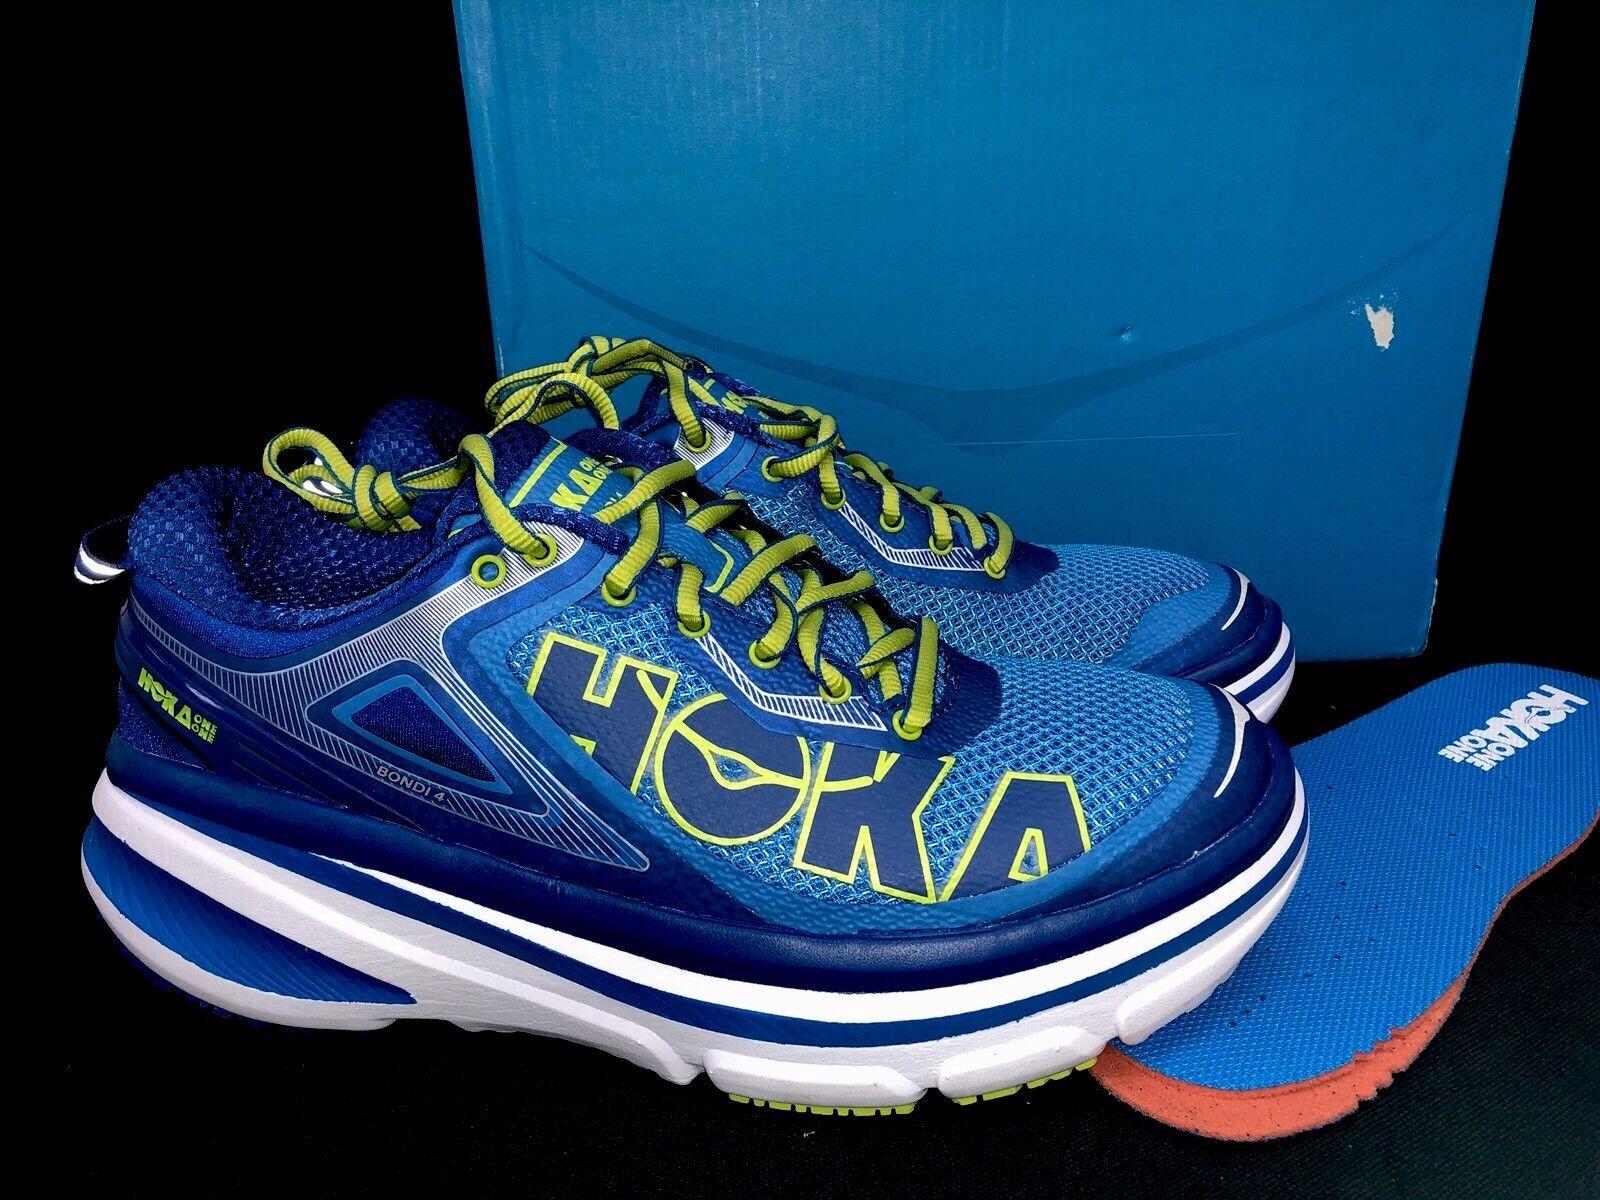 Hoka One One Bondi 4 Walking Tennis Trail shoes Directoire bluee Citrus Lace Up